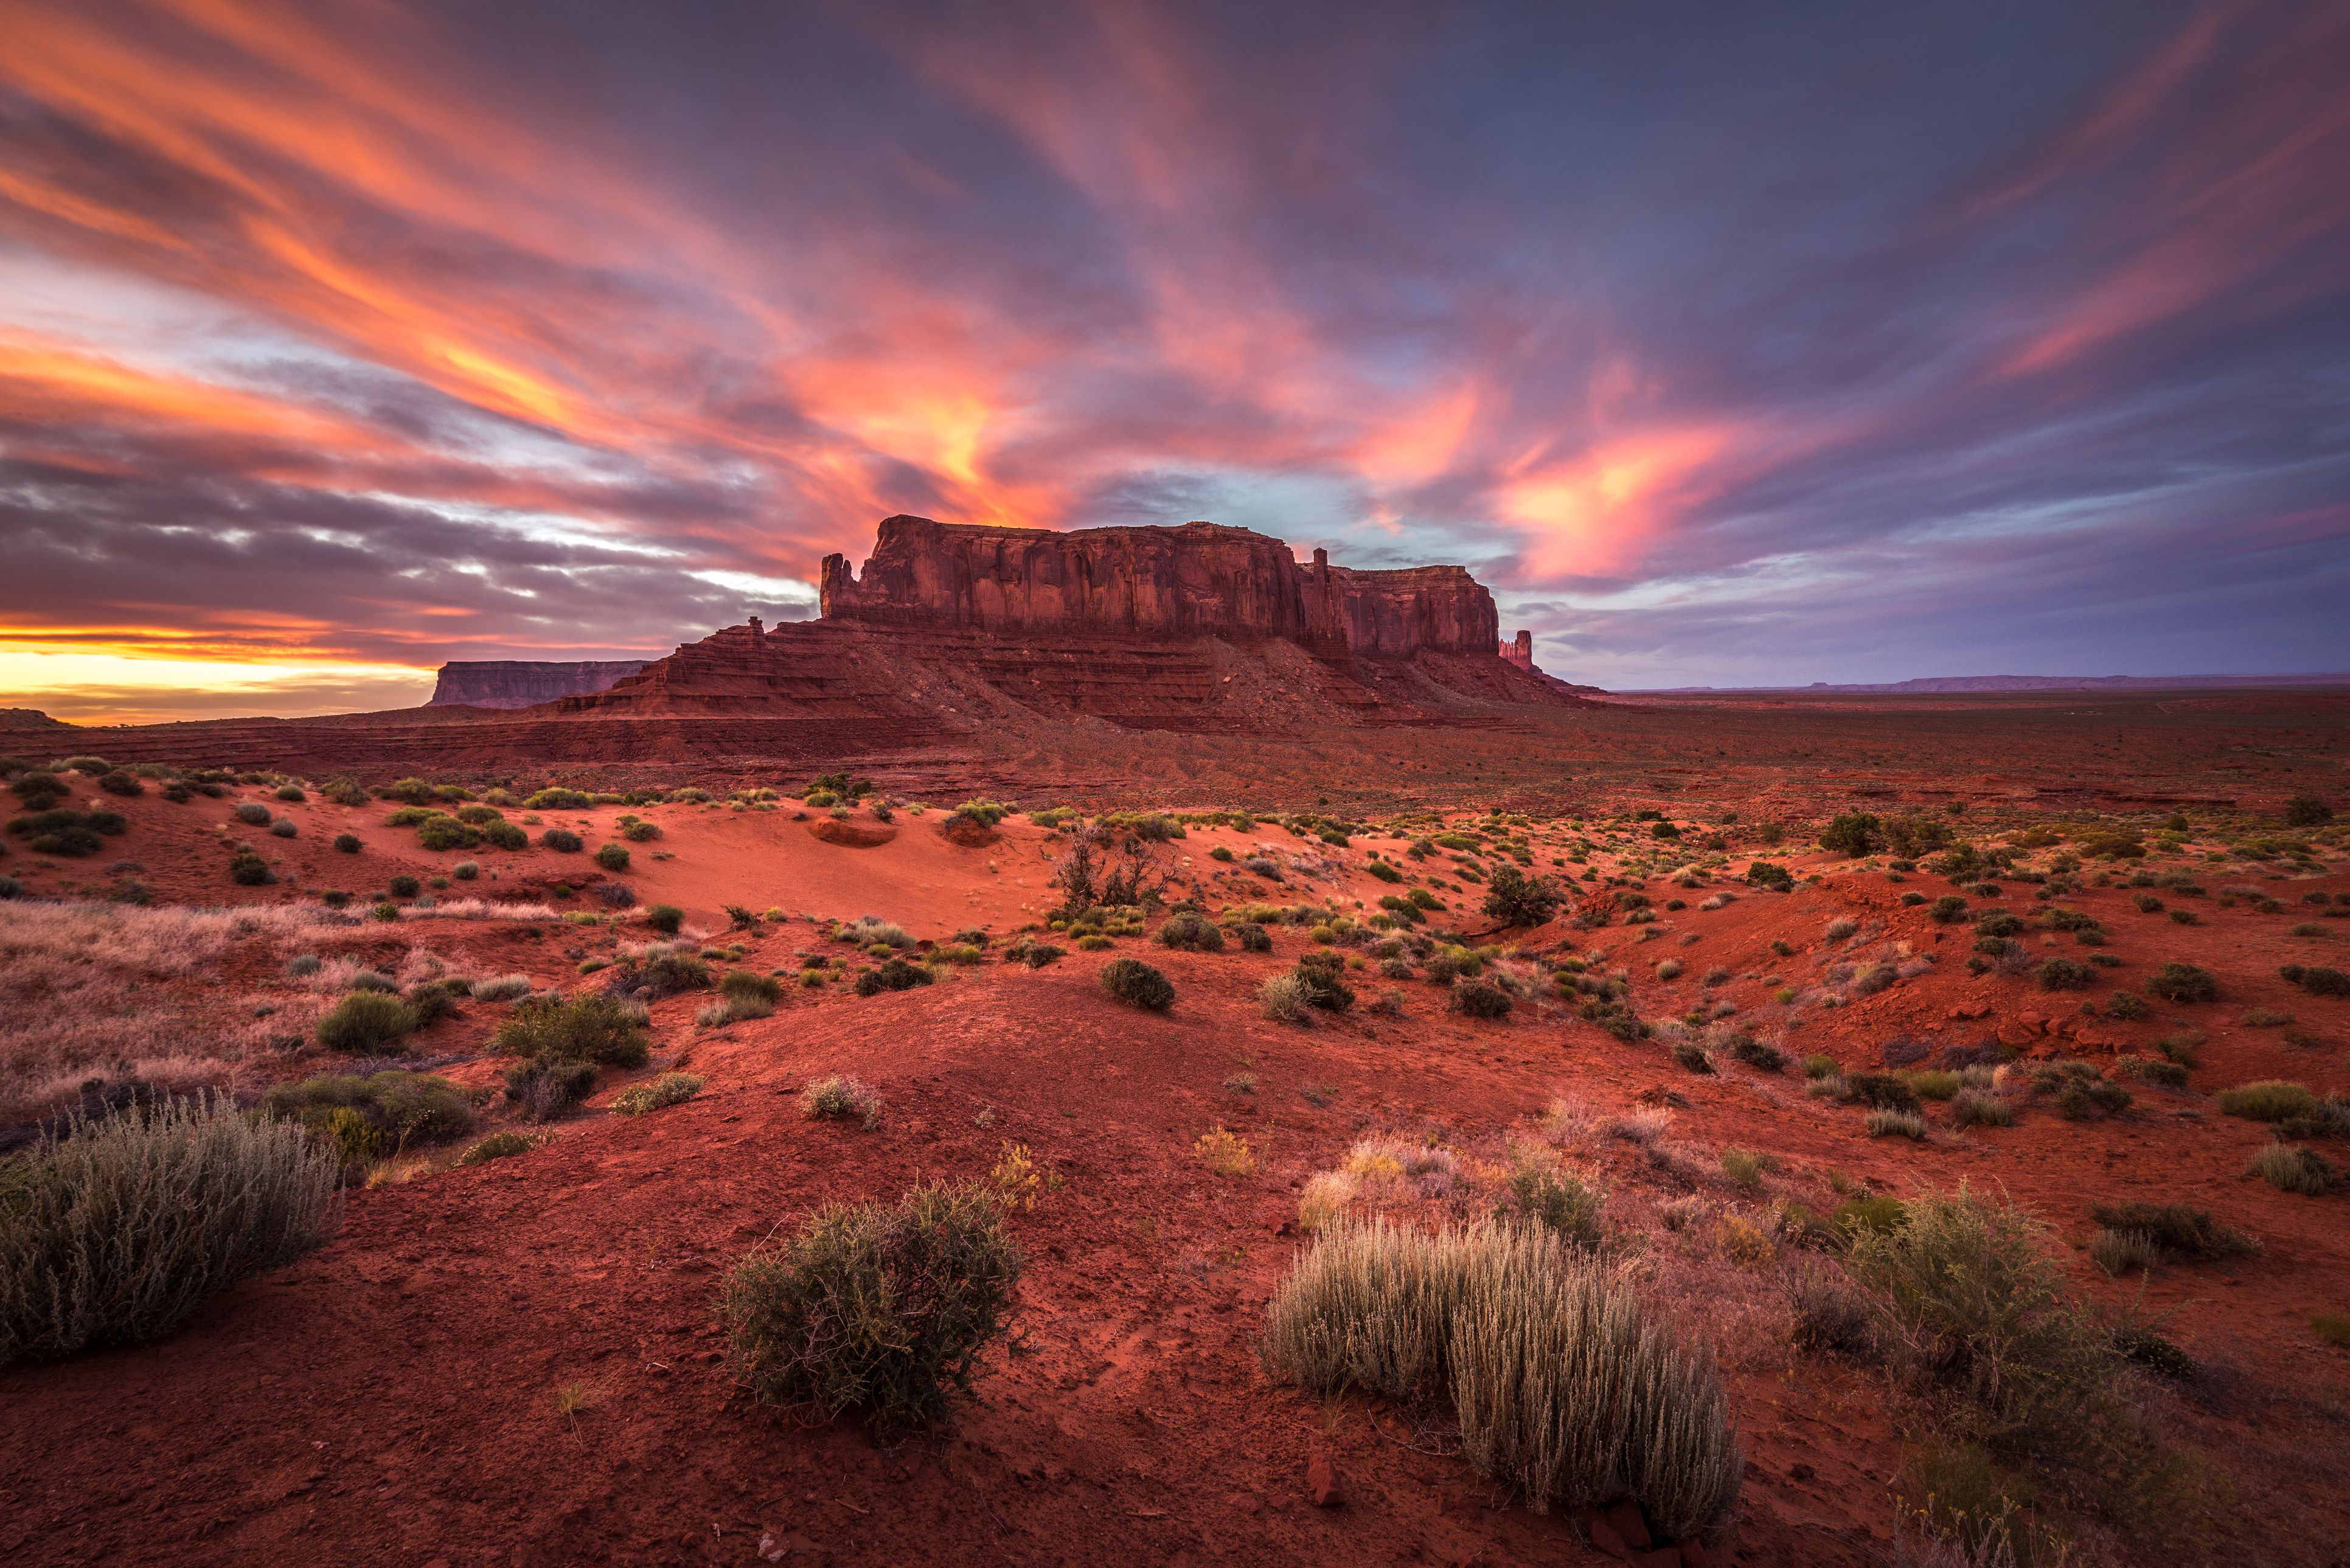 Sunset over Sentinel Mesa, Monument Valley, Arizona.